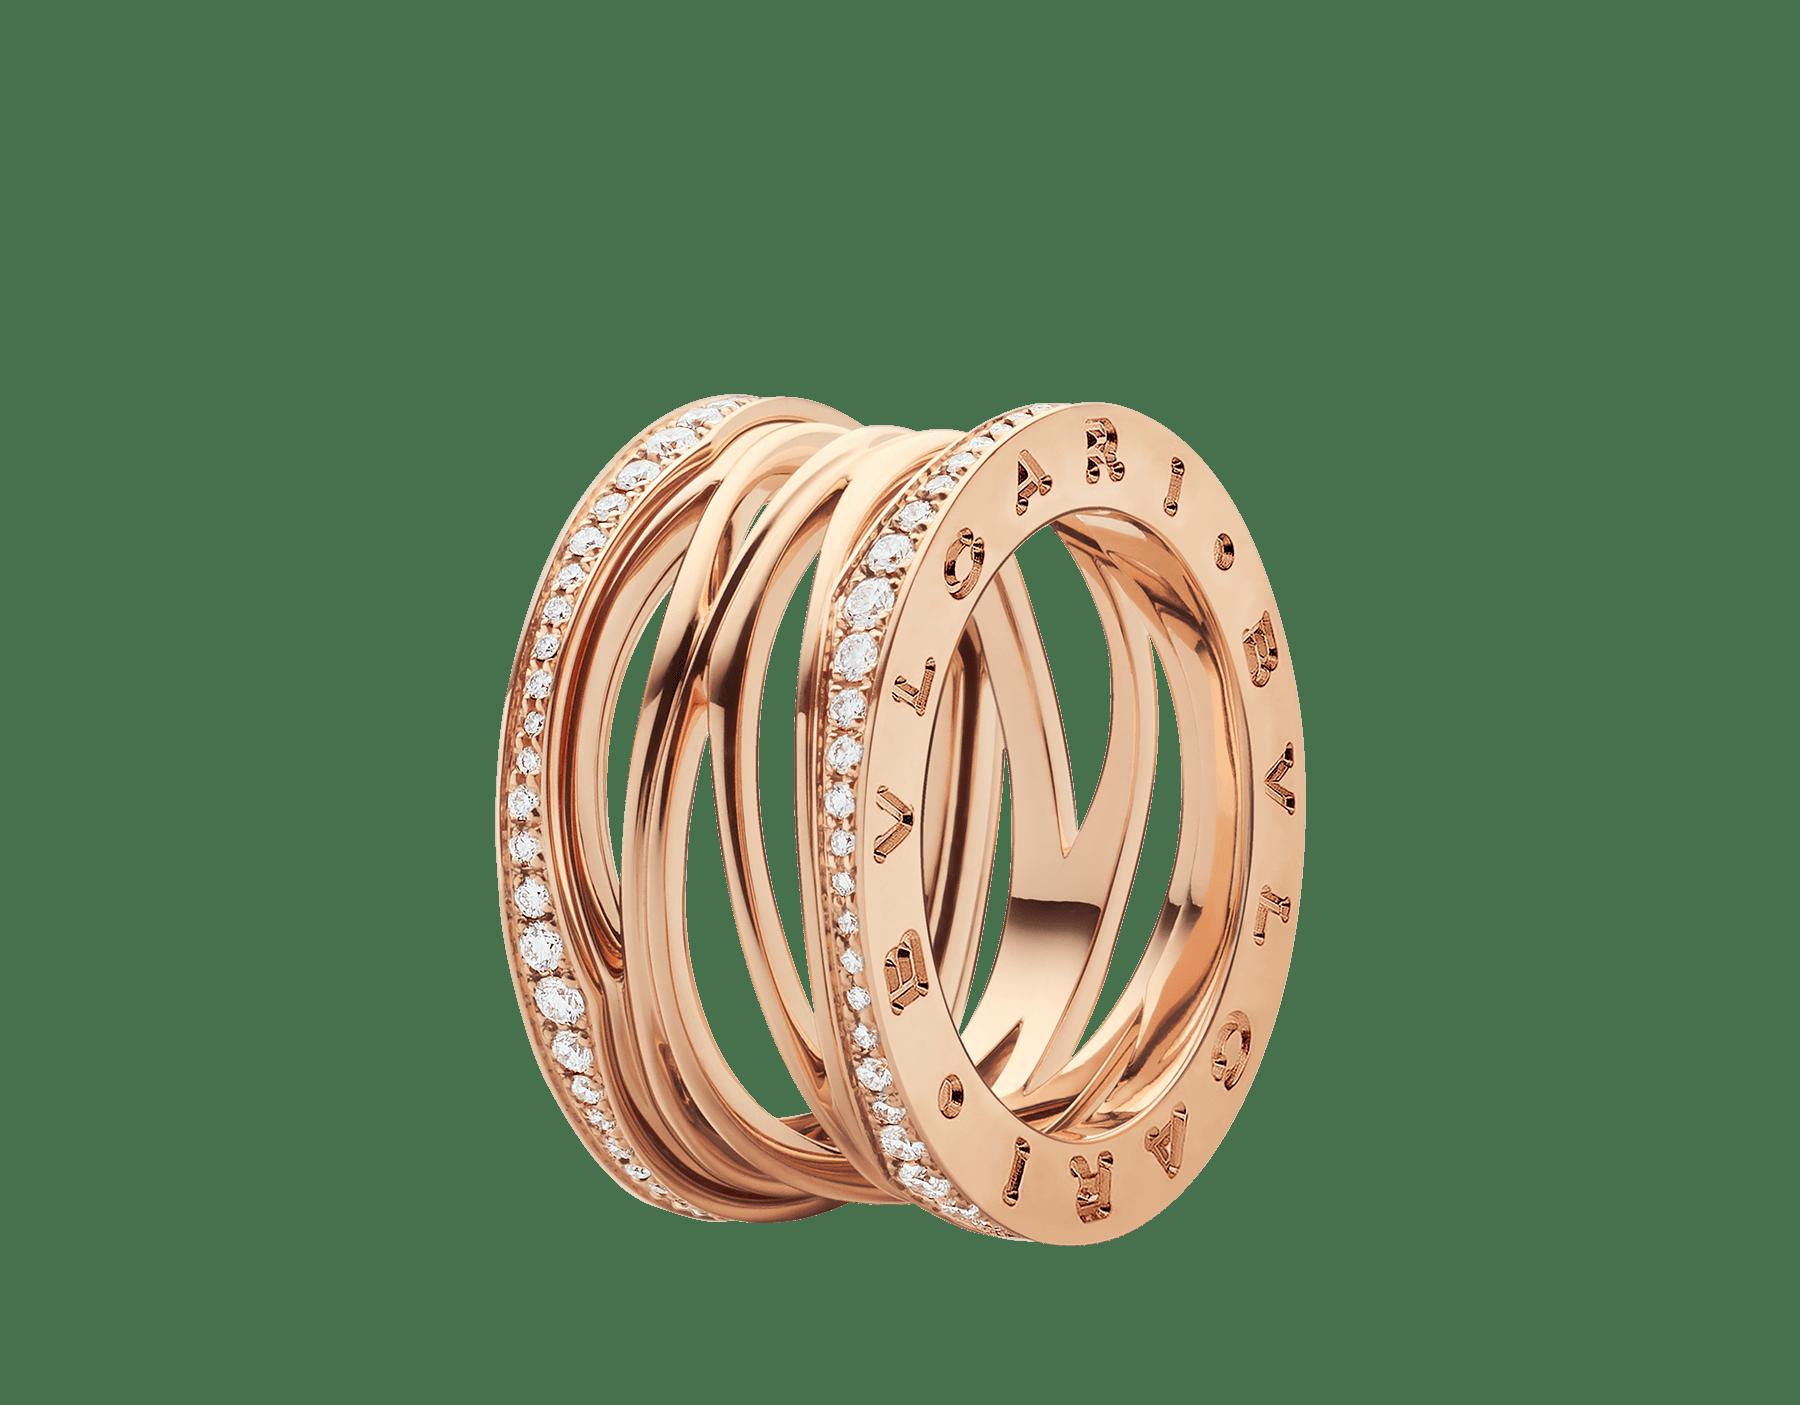 Anillo B.zero1 Design Legend de cuatro bandas en oro rosa de 18 qt con pavé de diamantes (0,61 ct) en los bordes. B-zero1-4-bands-AN858125 image 1